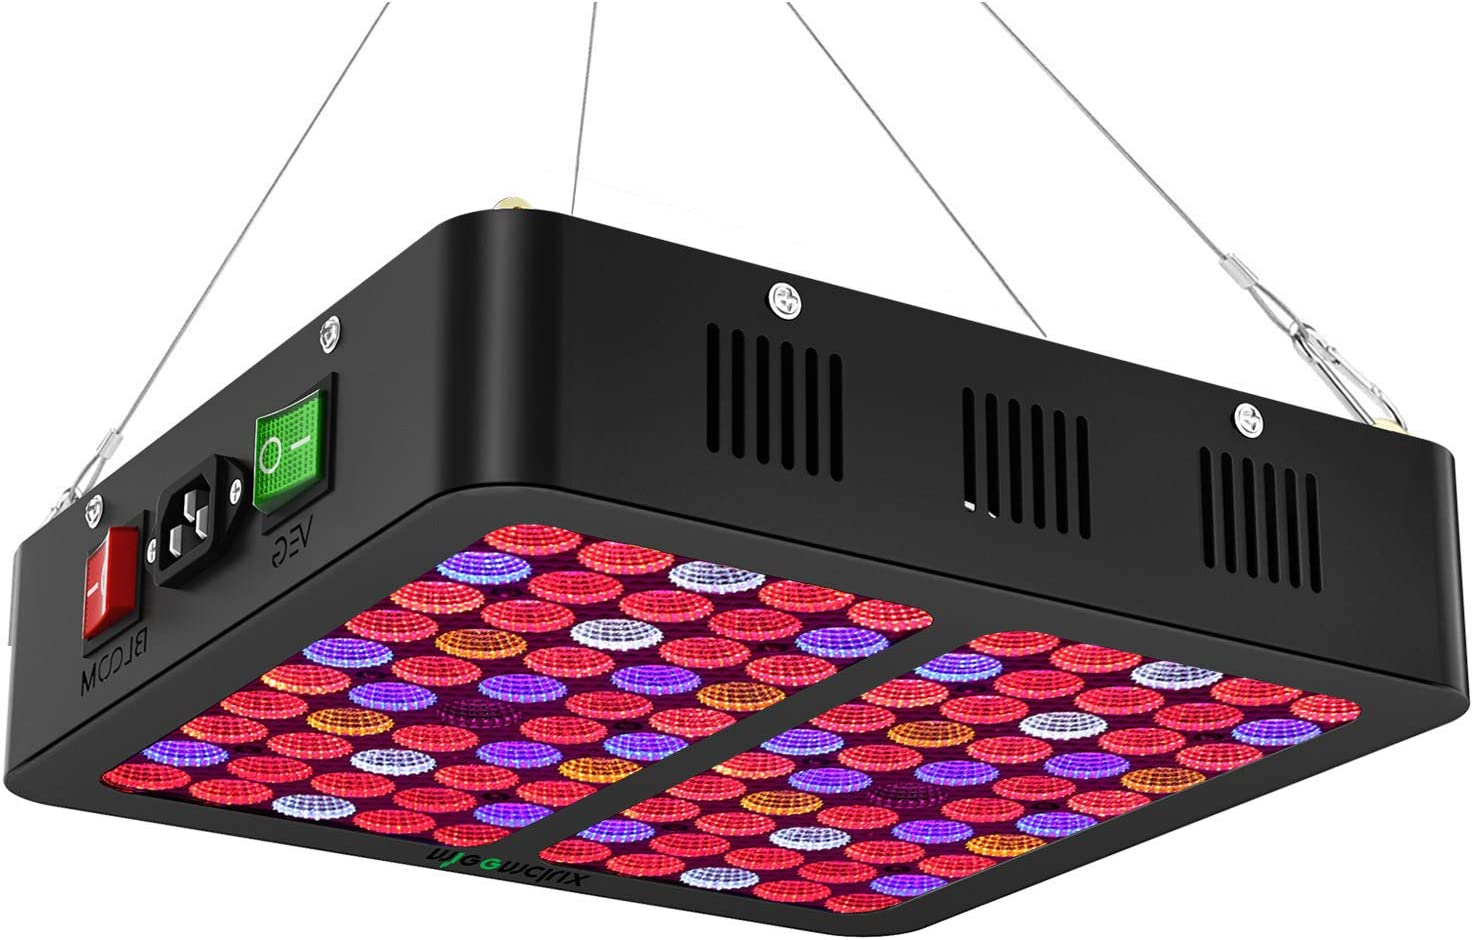 Mieemclux 1000w LED Grow Light